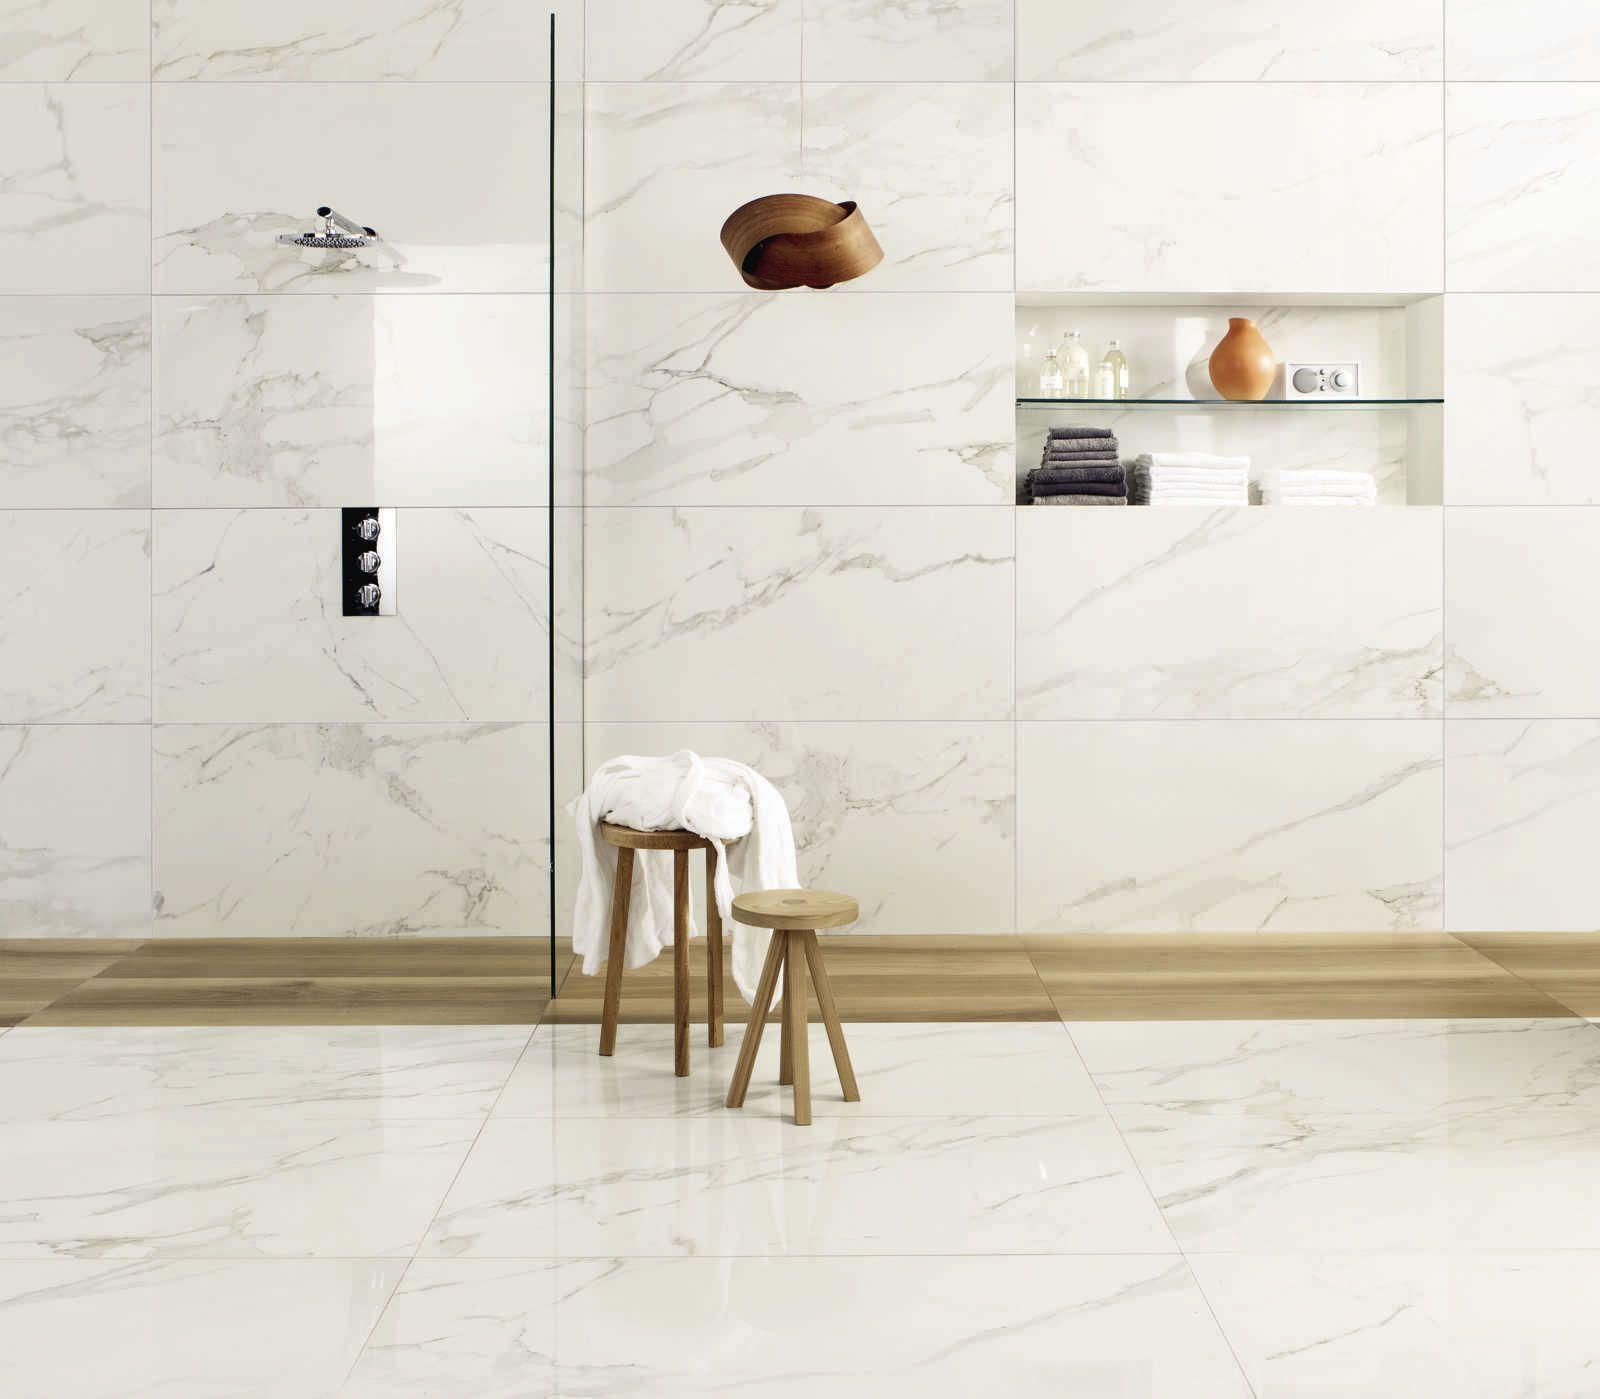 Delighted 16 Ceramic Tile Big 24 Ceramic Tile Shaped 3D Ceramic Wall Tiles 3X6 Glass Subway Tile Backsplash Youthful 6 X 12 Glass Subway Tile FreshAcoustical Ceiling Tiles Prices  Polished   ANIMA ..